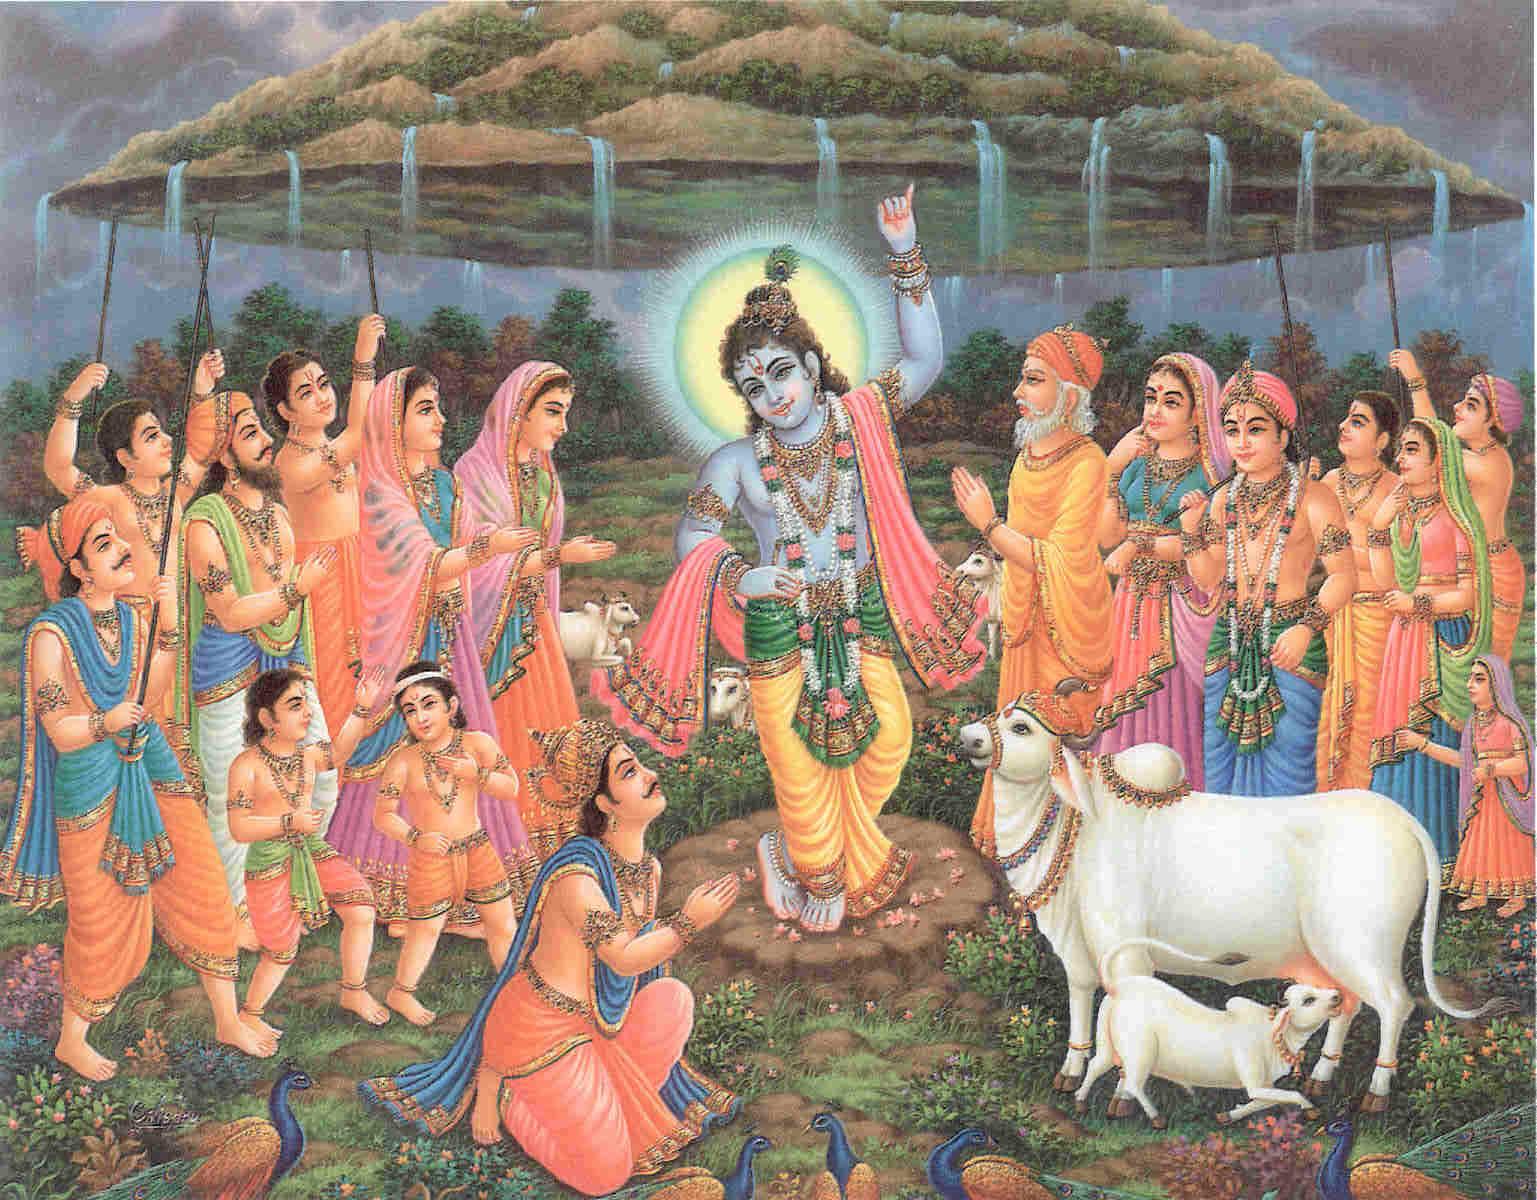 http://4.bp.blogspot.com/-v_7L5HOVtDo/Tj1aFchZvzI/AAAAAAAAABk/zCM5_Iy5gQc/s1600/Krishna-lifts-mountain-Govardhana.jpg